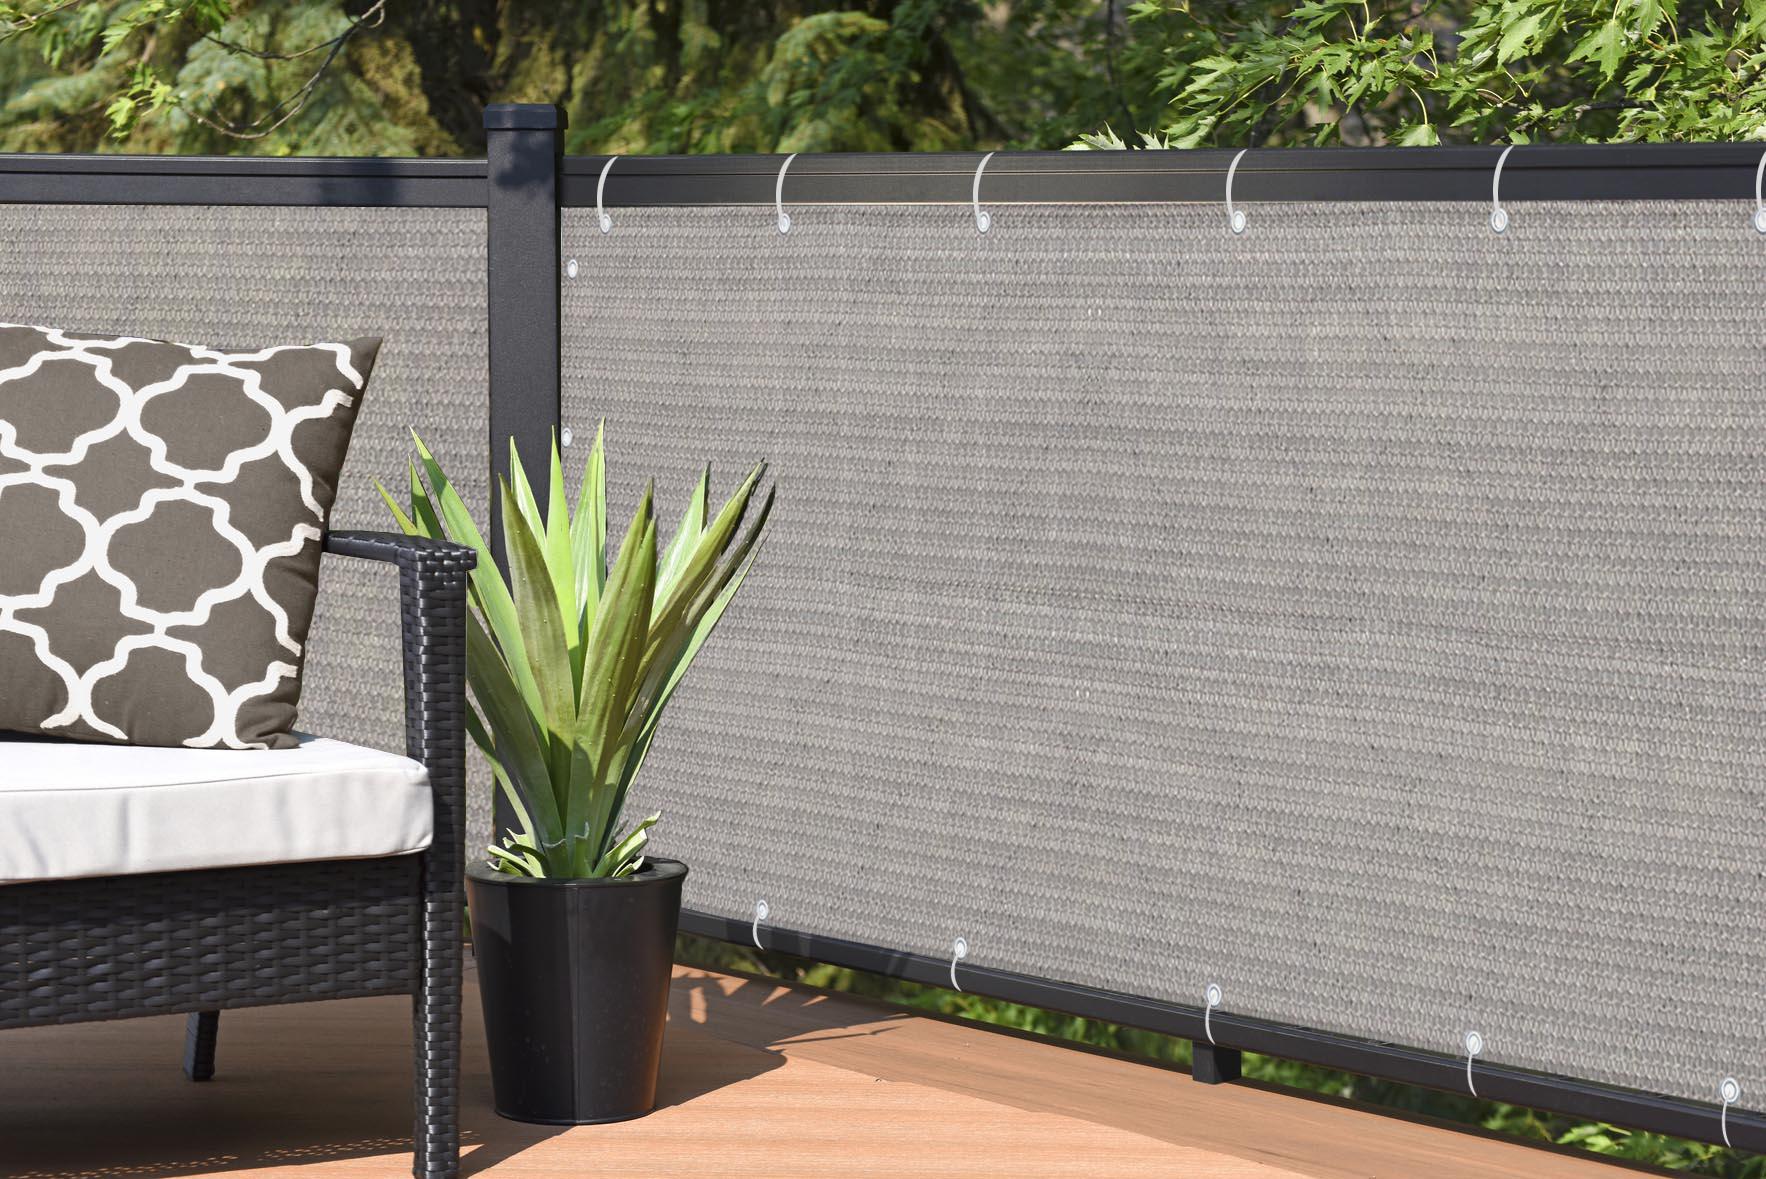 alion home smoke tan elegant privacy screen for backyard deck patio balcony fence pool porch railing no black trim 4 x 14 walmart com walmart com